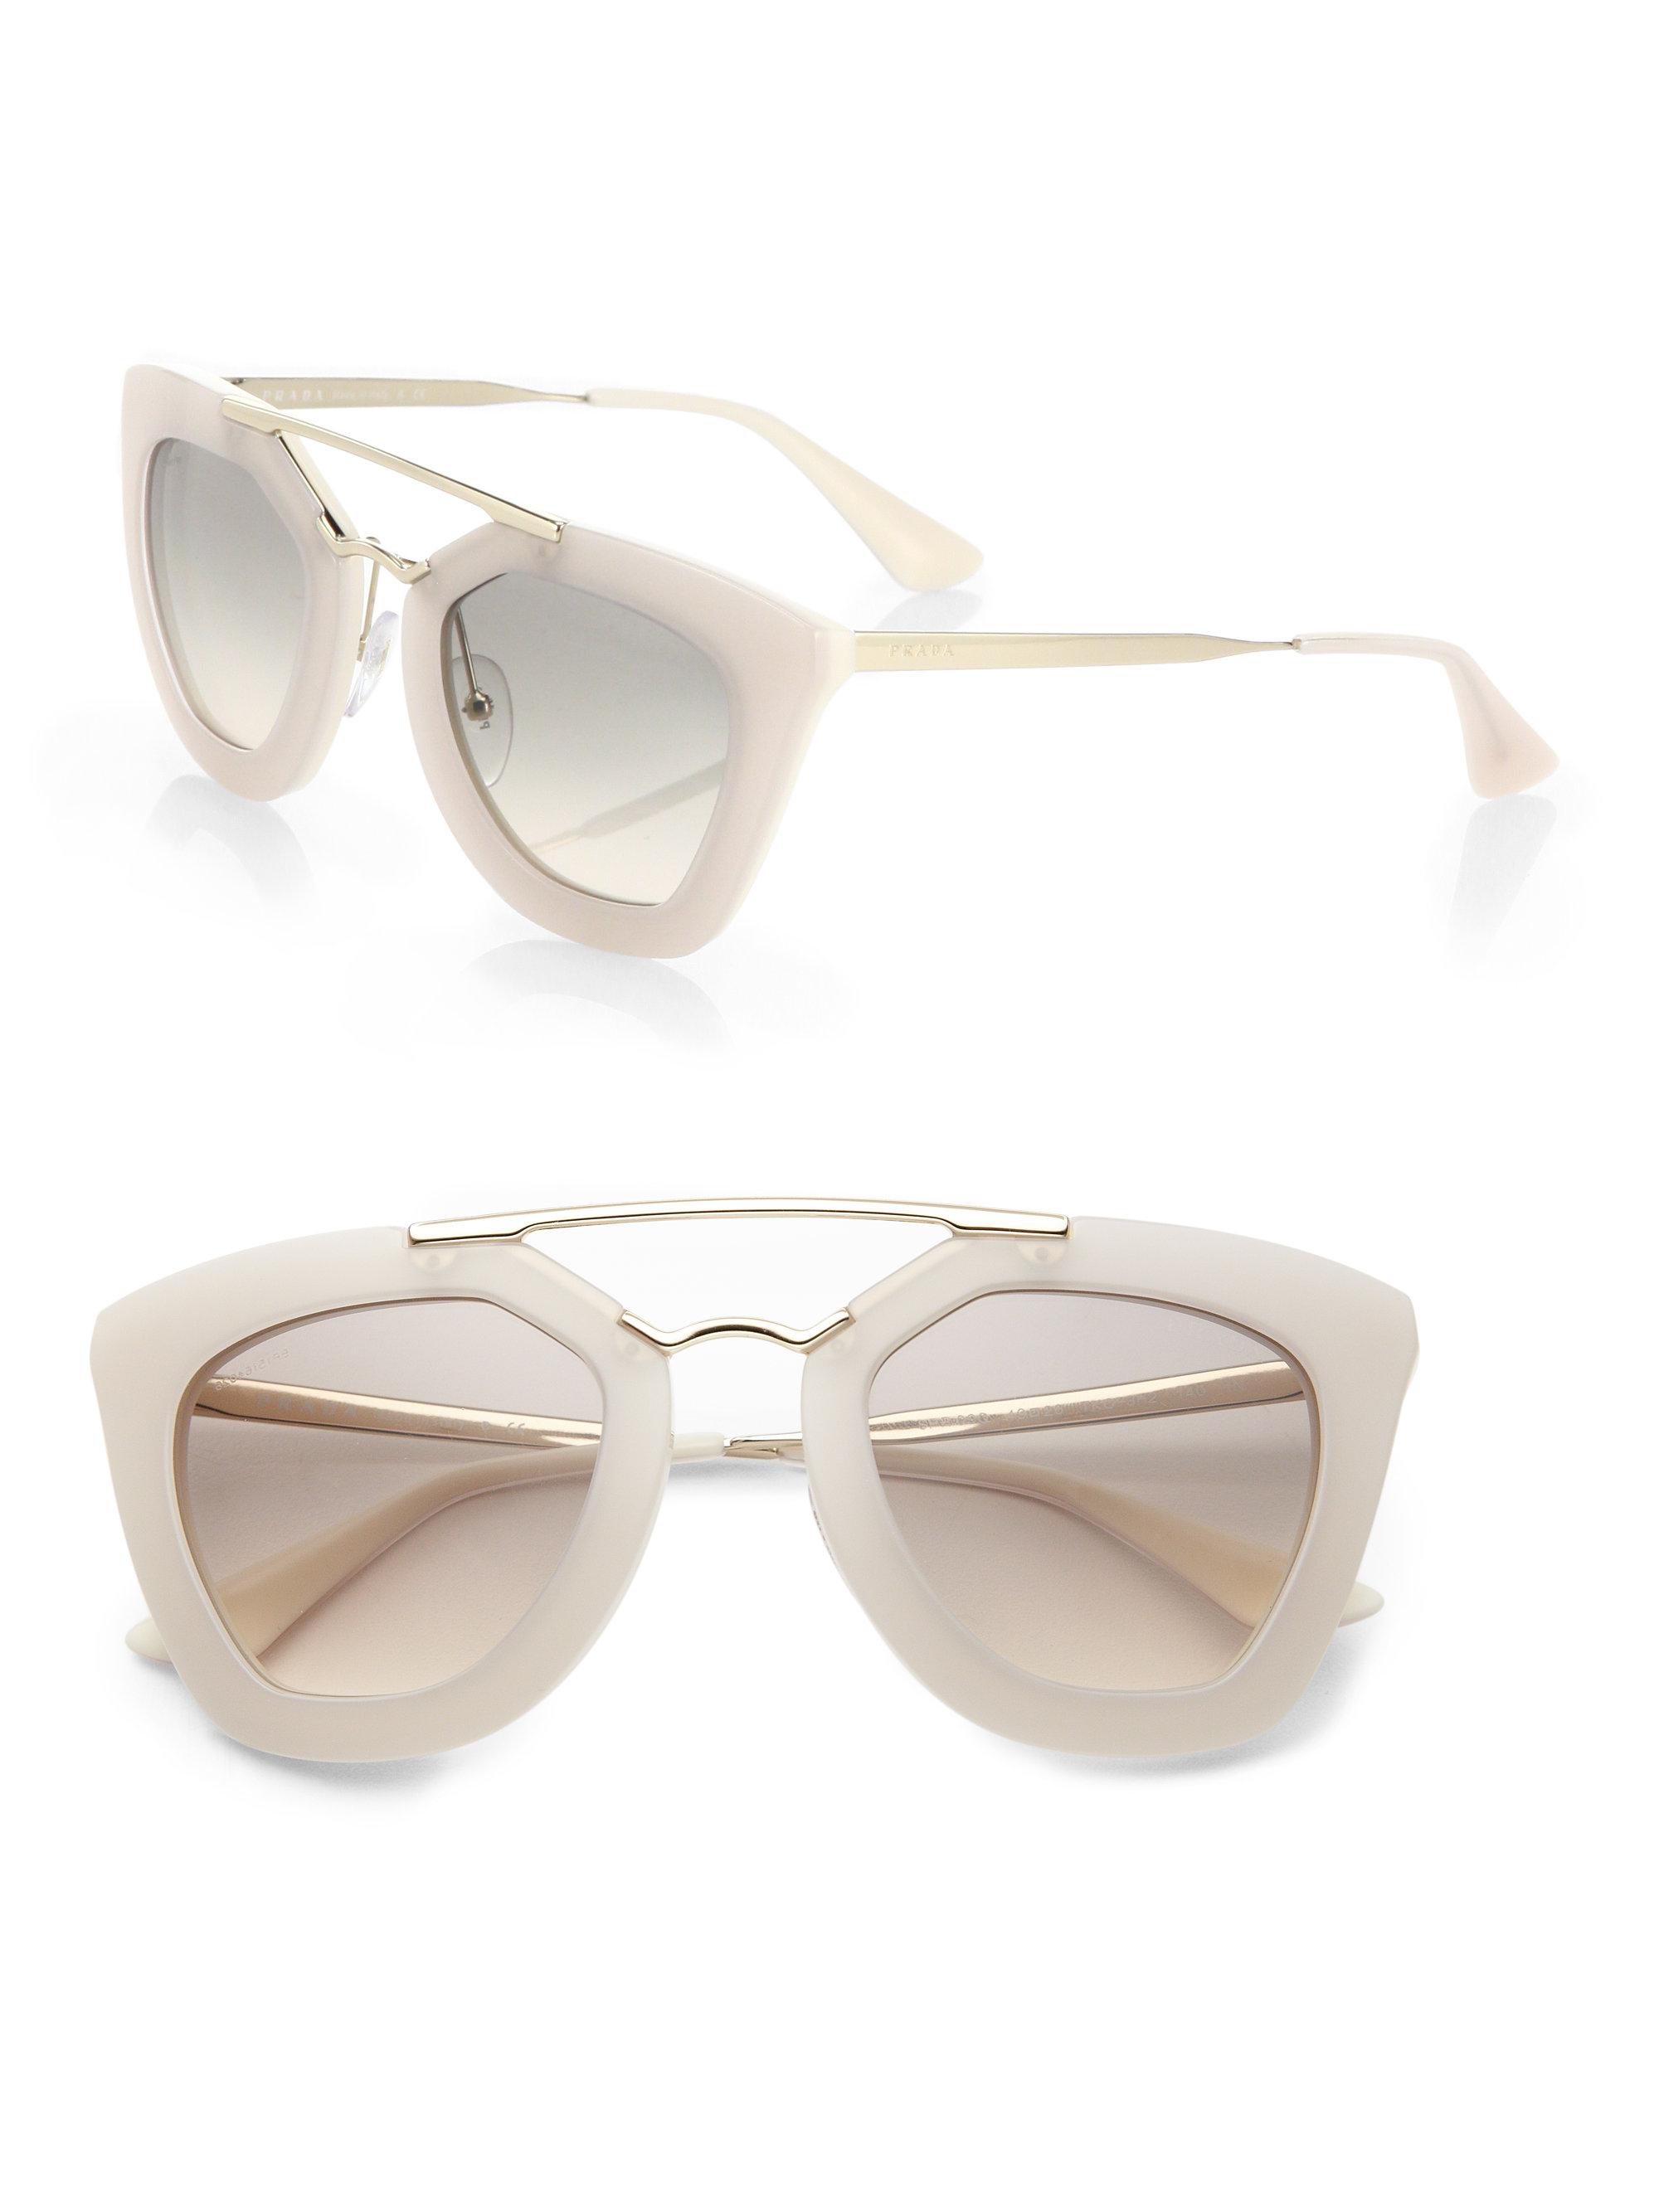 Prada White Frame Glasses : Prada 49mm Angular-frame Sunglasses in White Lyst